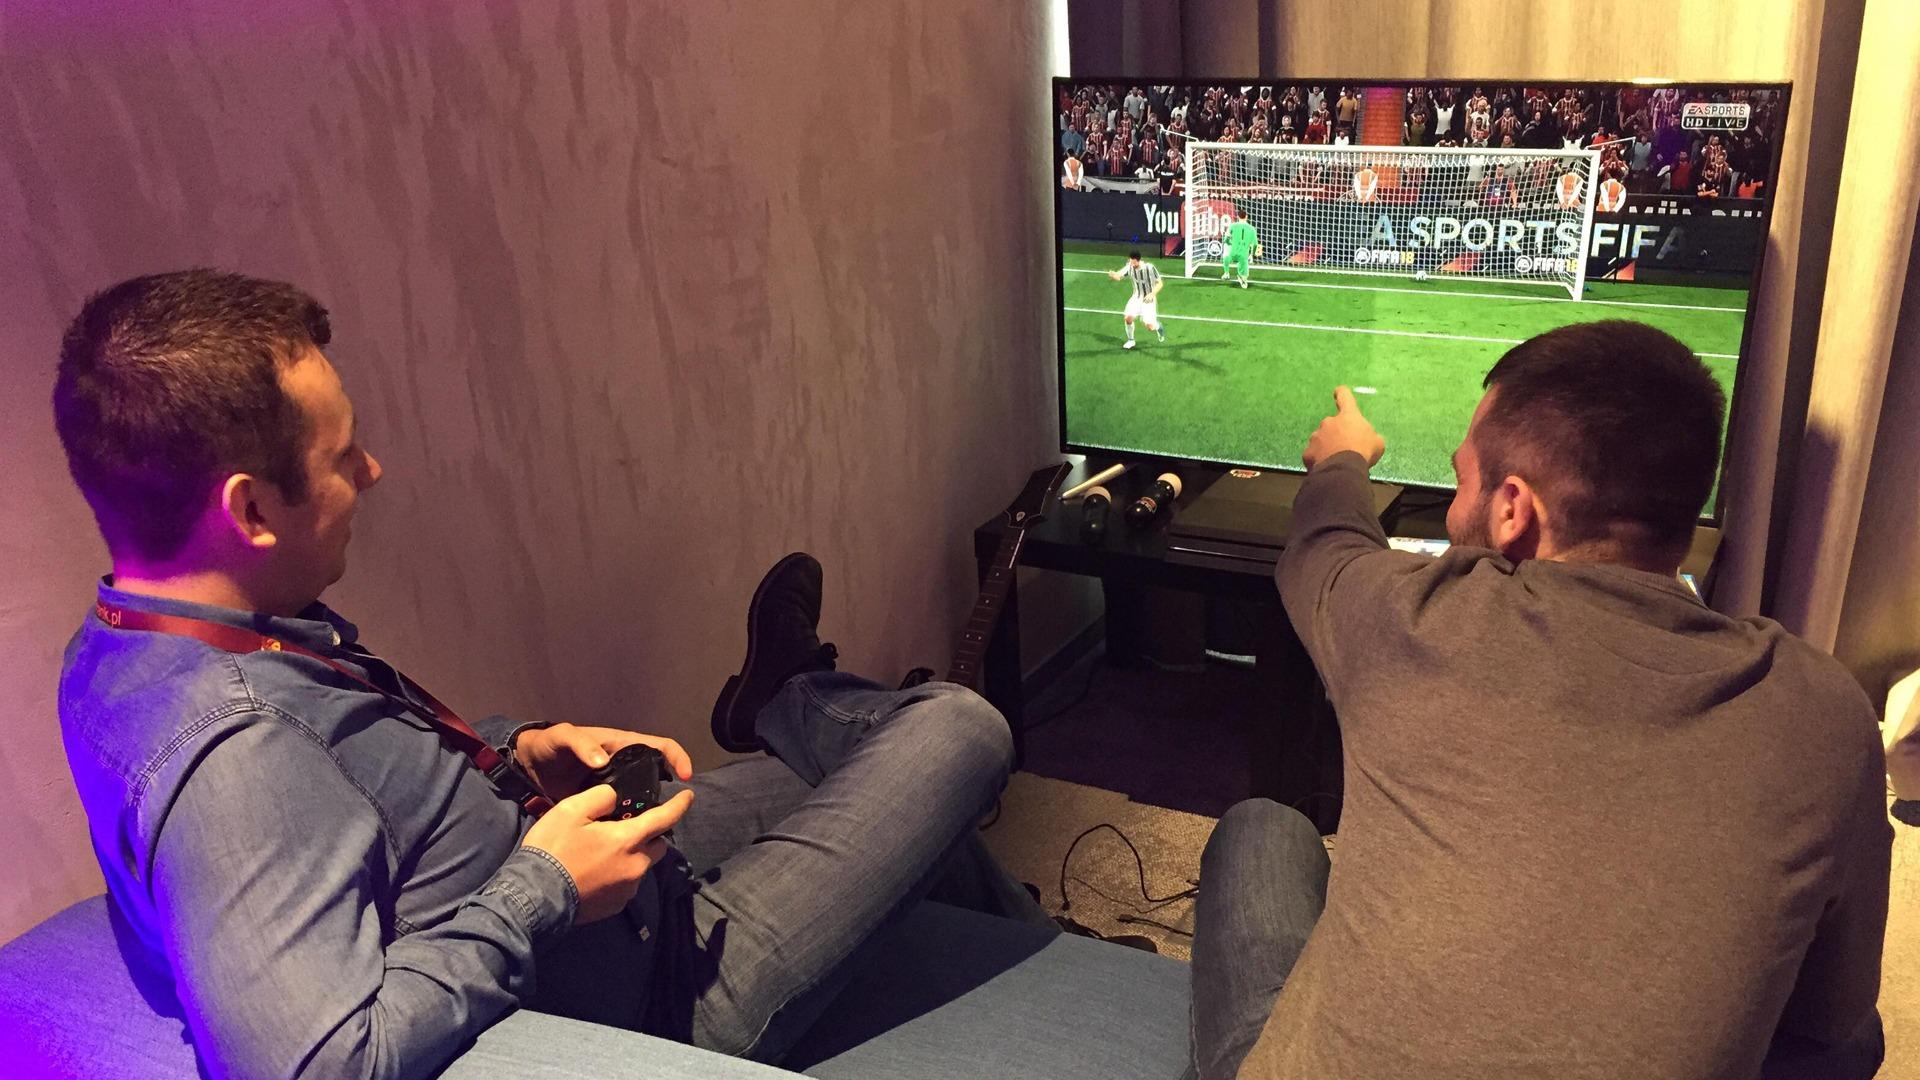 Konsole PlayStation FIFA wynajem